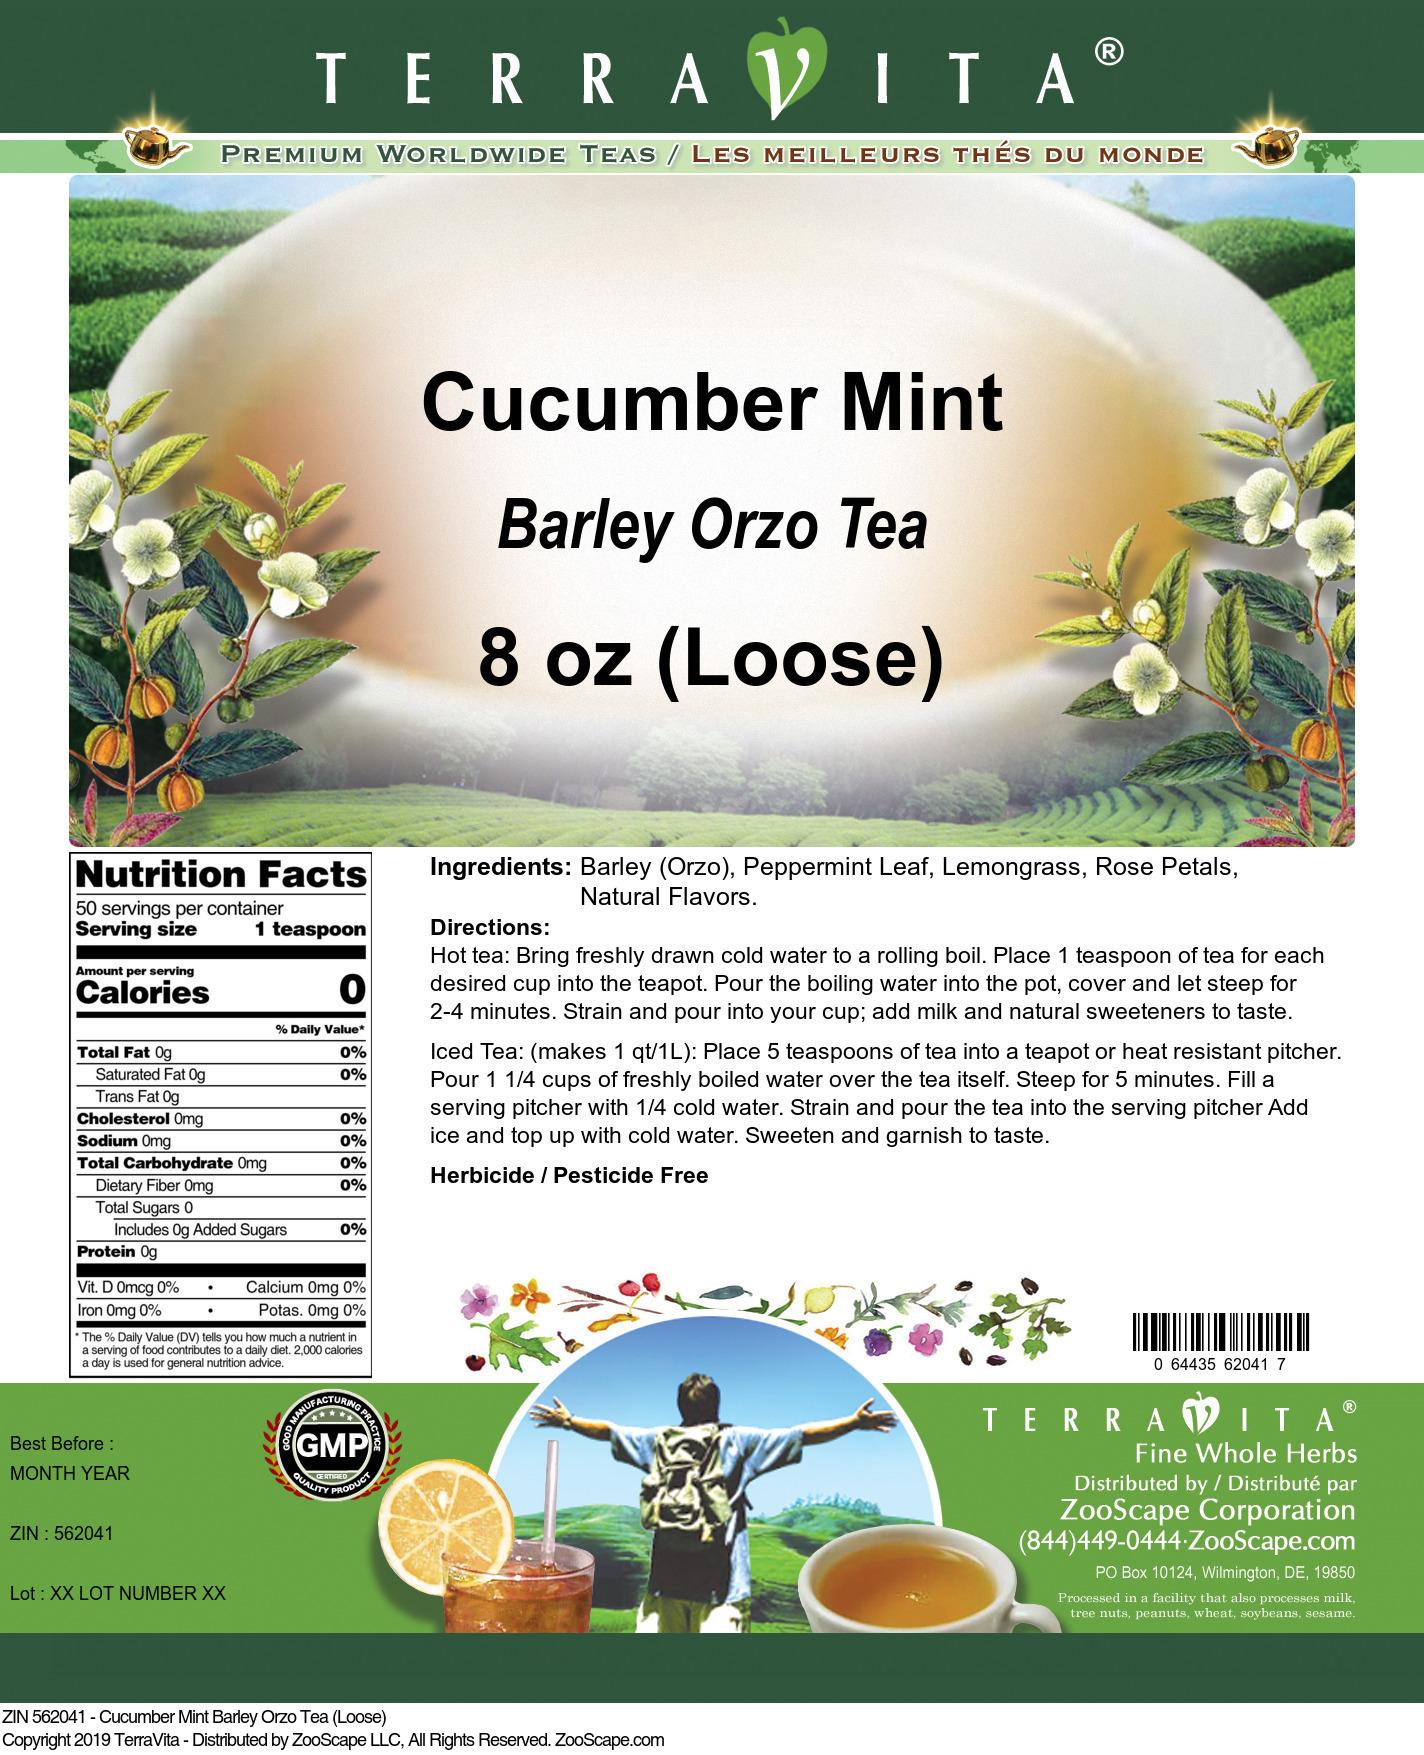 Cucumber Mint Barley Orzo